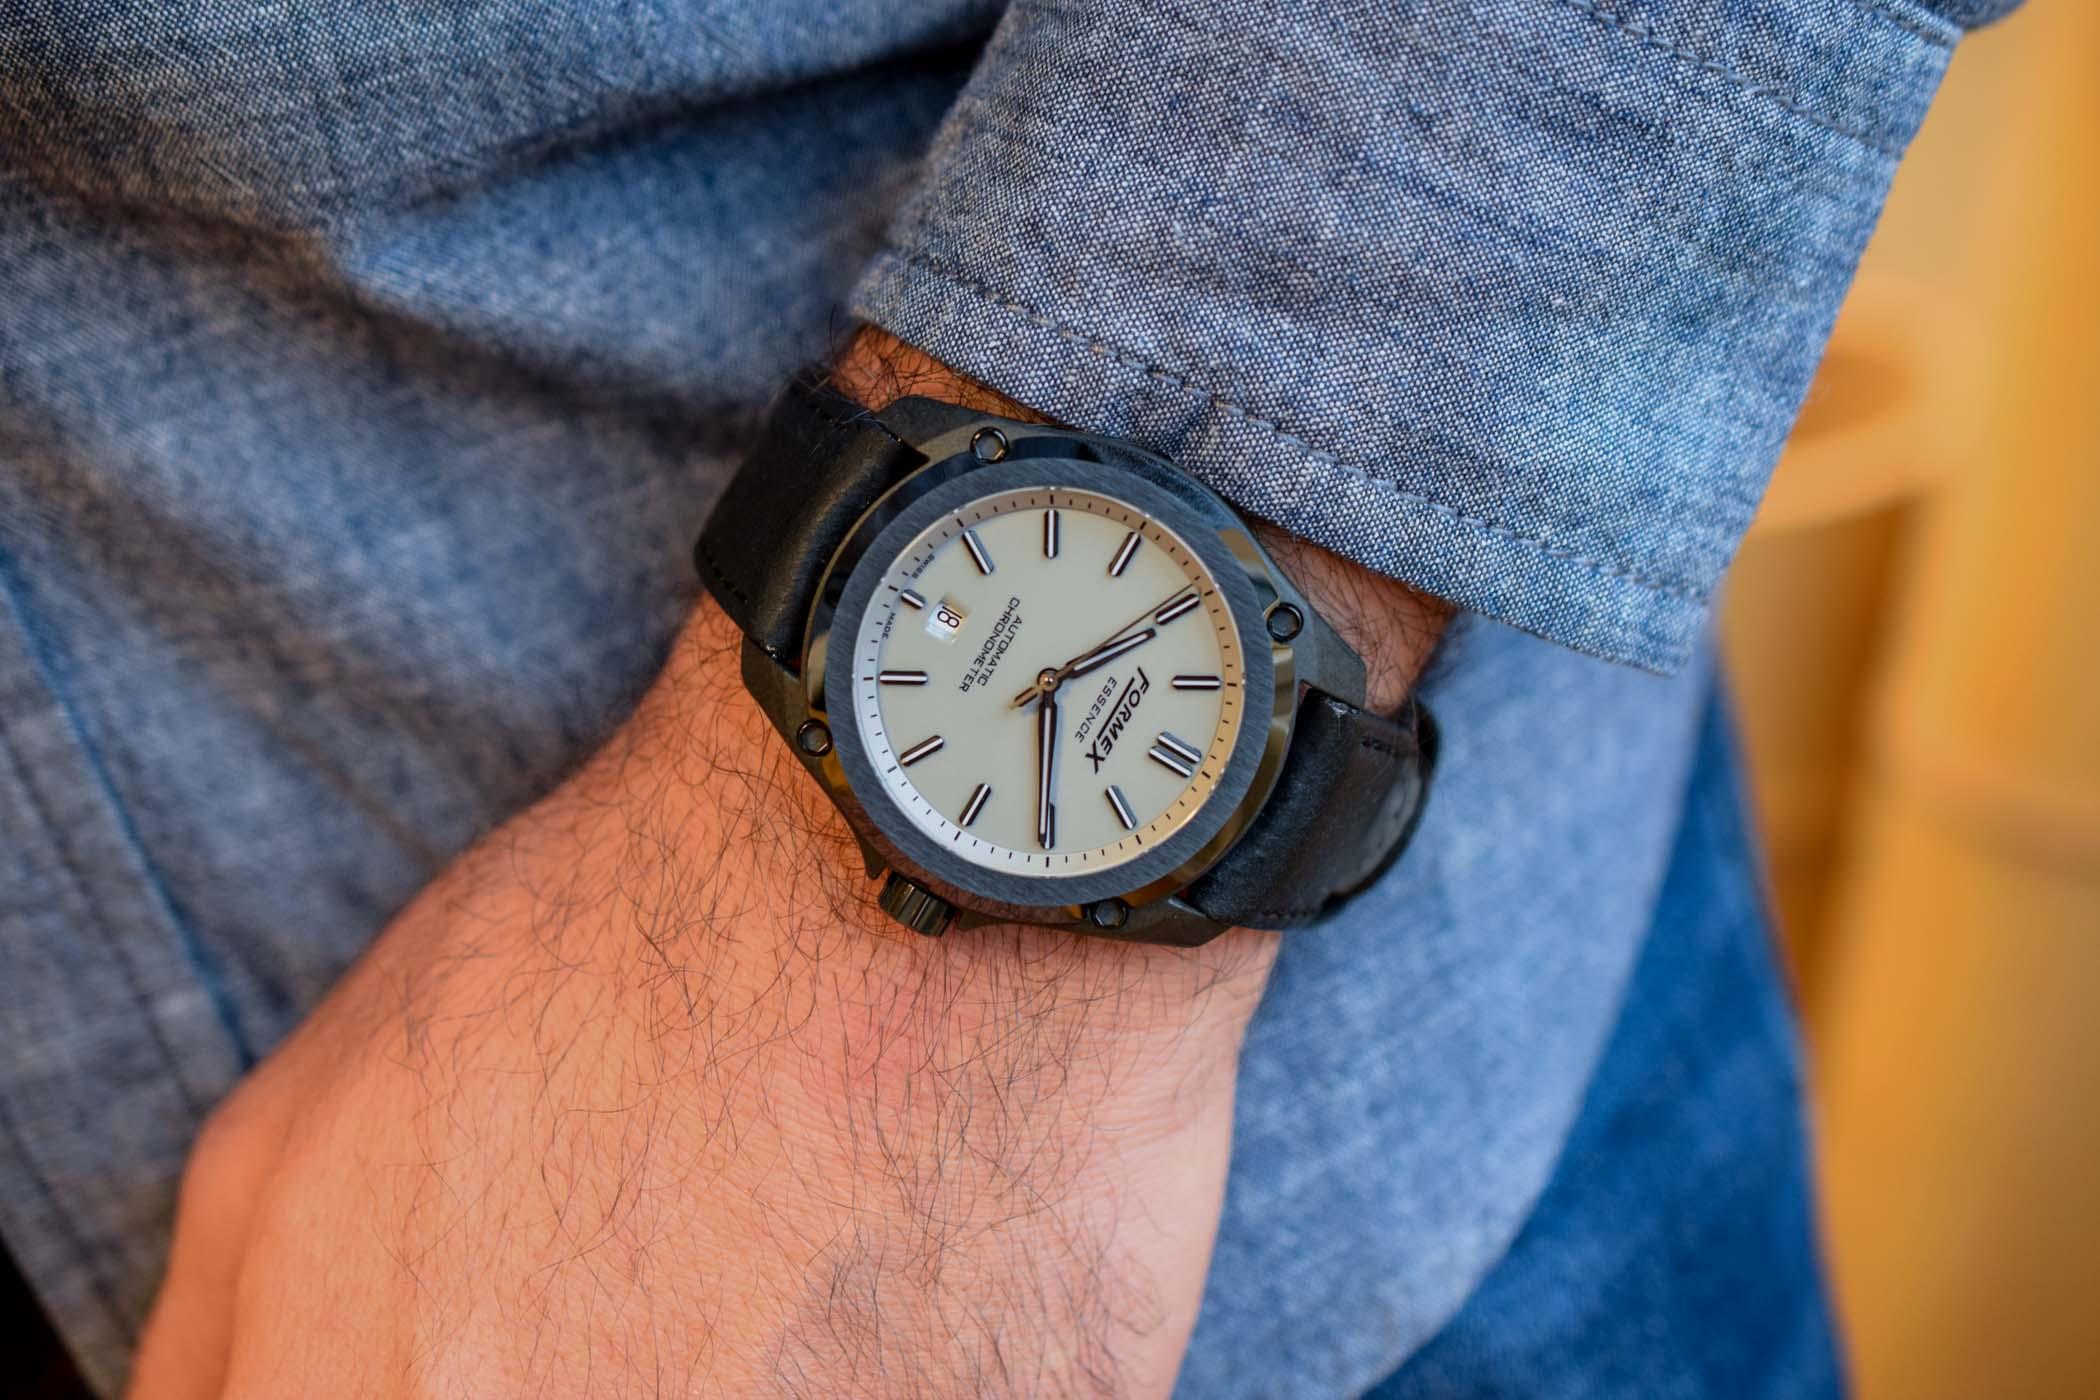 Formex Essence Leggera - Chronometer Certified Carbon Watch Value Proposition